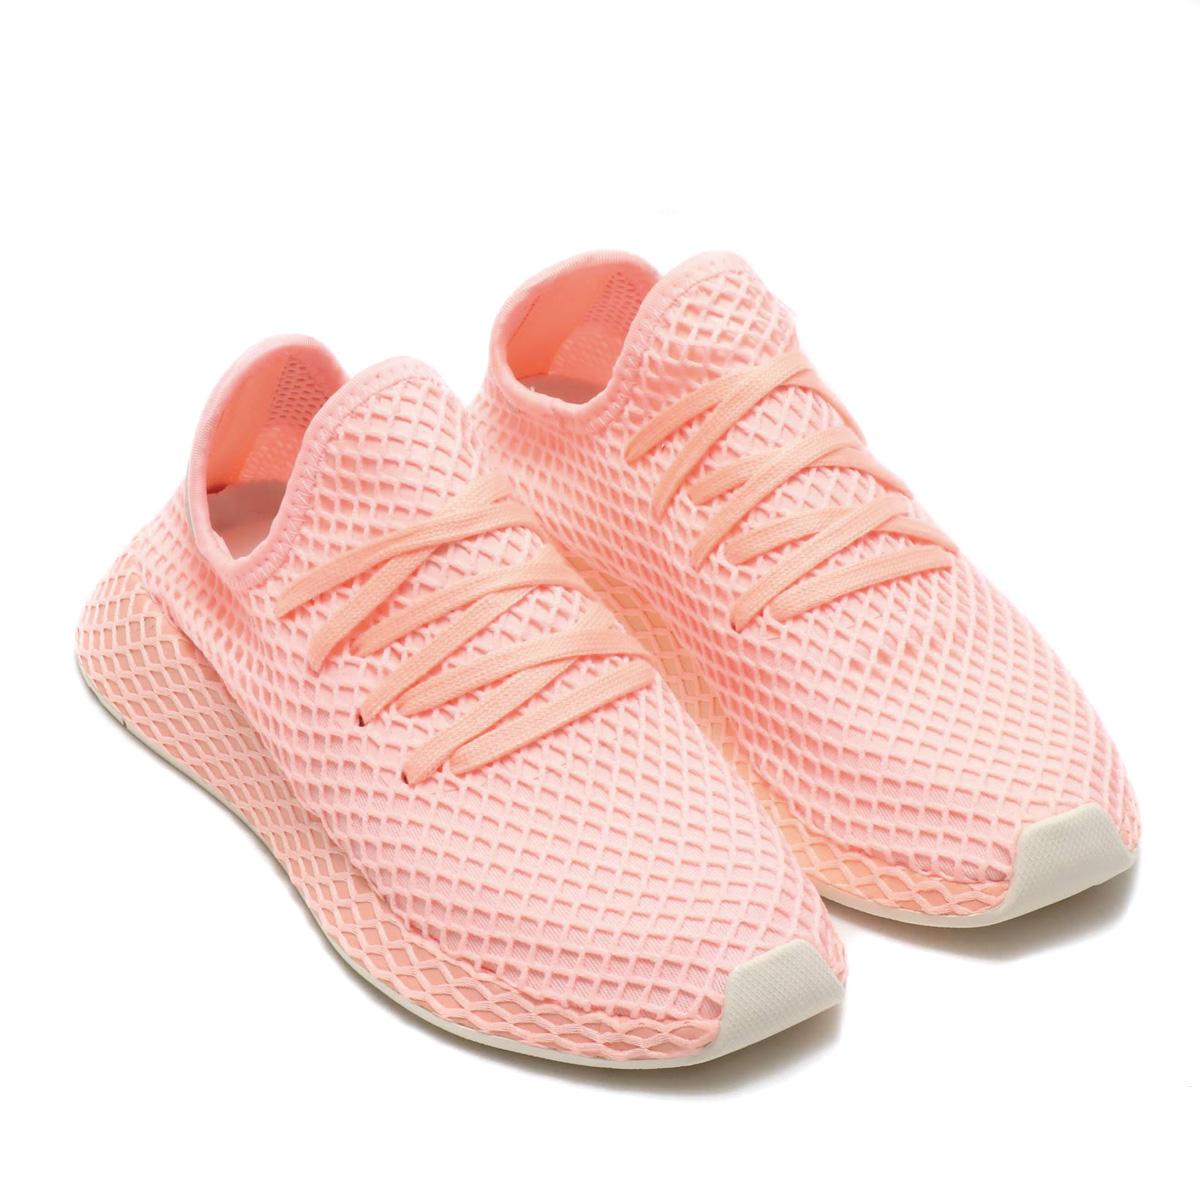 adidas deerupt runner atmos pink